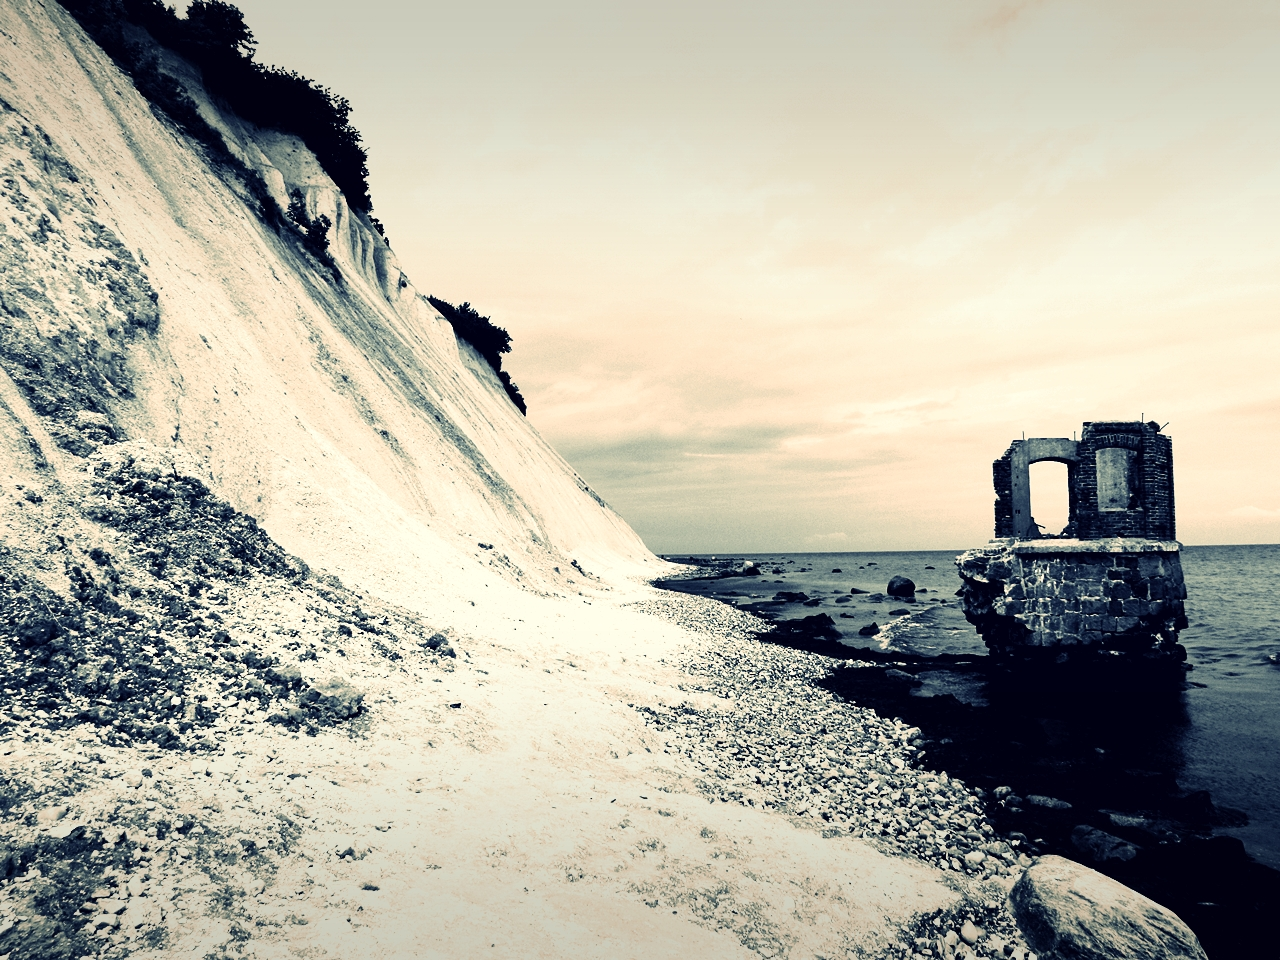 Die Ruine des Pegelturms in Kap Arkona 2